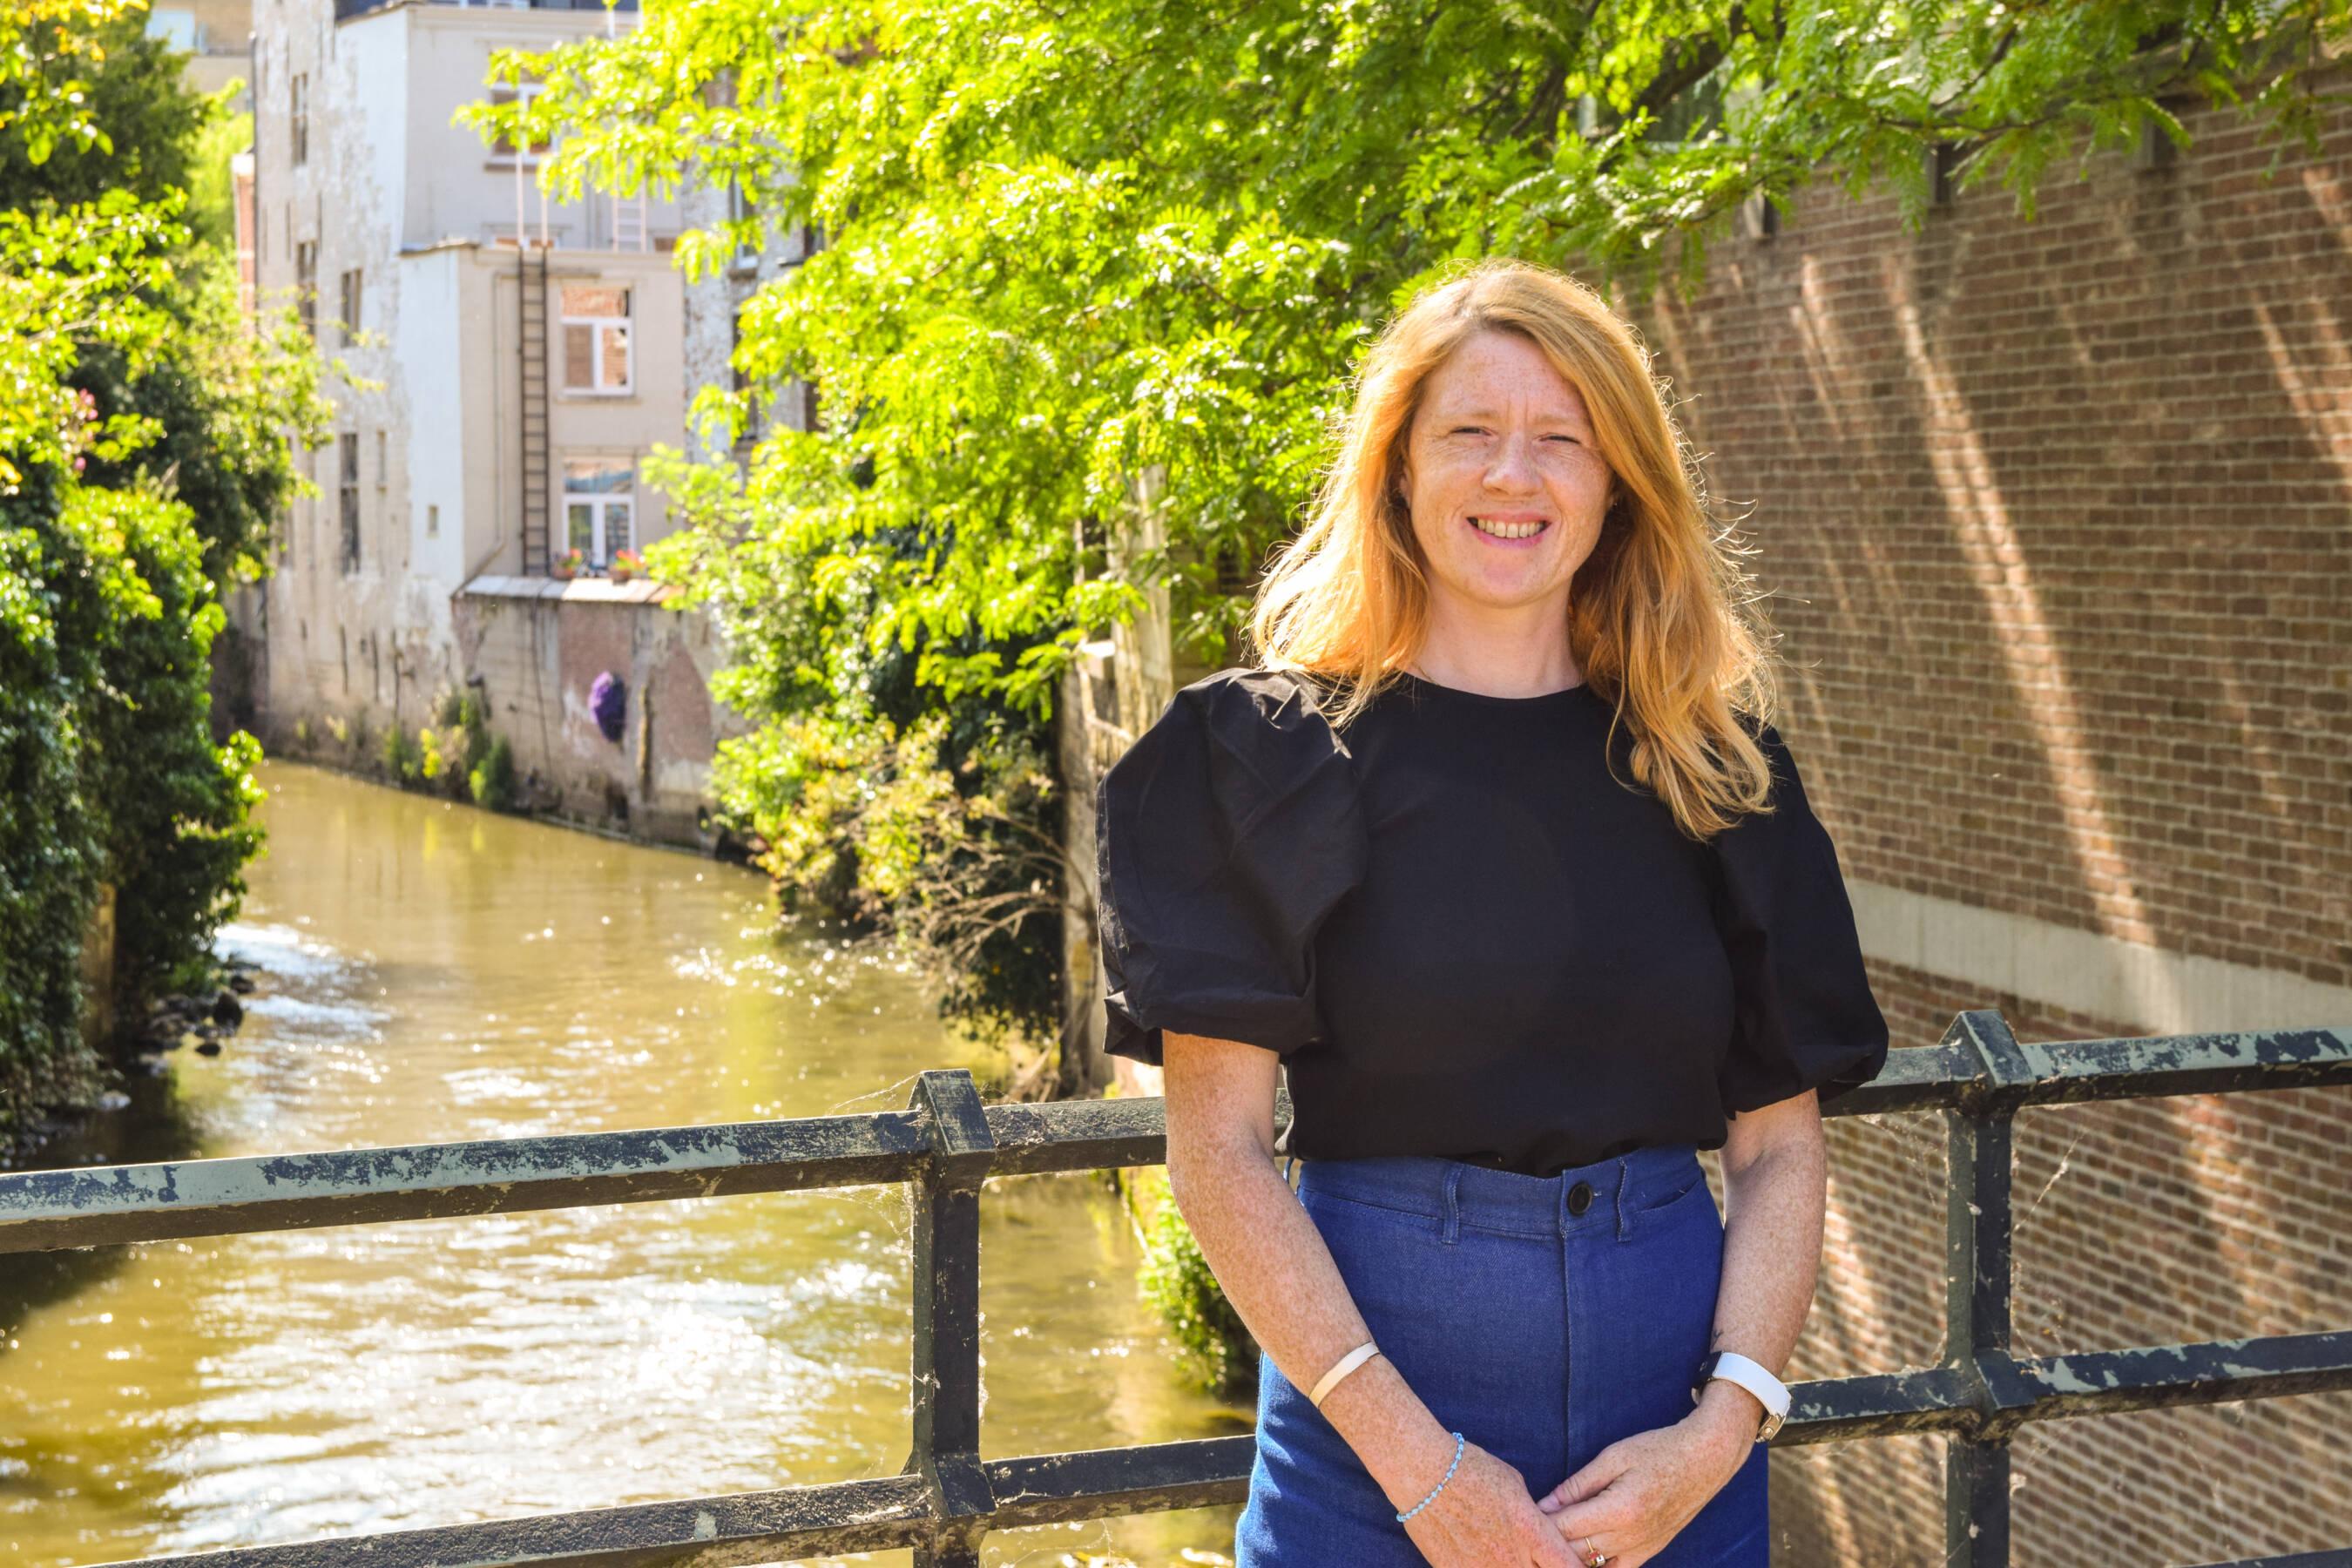 Carla Van Corenland - Copyright Luna d'Hoine